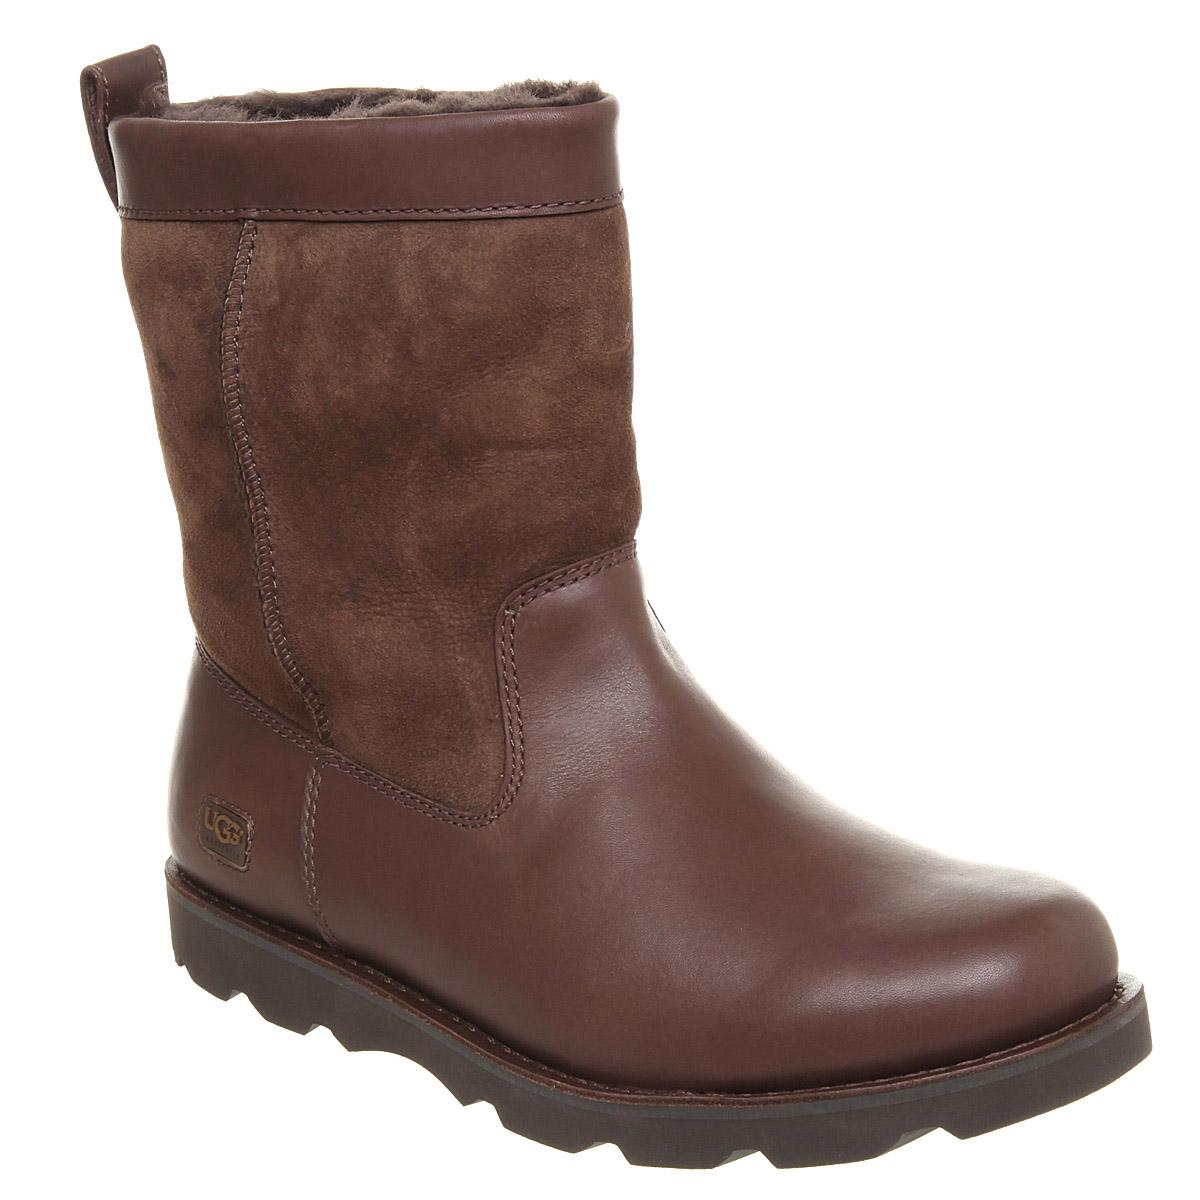 Mens Ugg Australia Wrangell Boot Choc Leather Boots